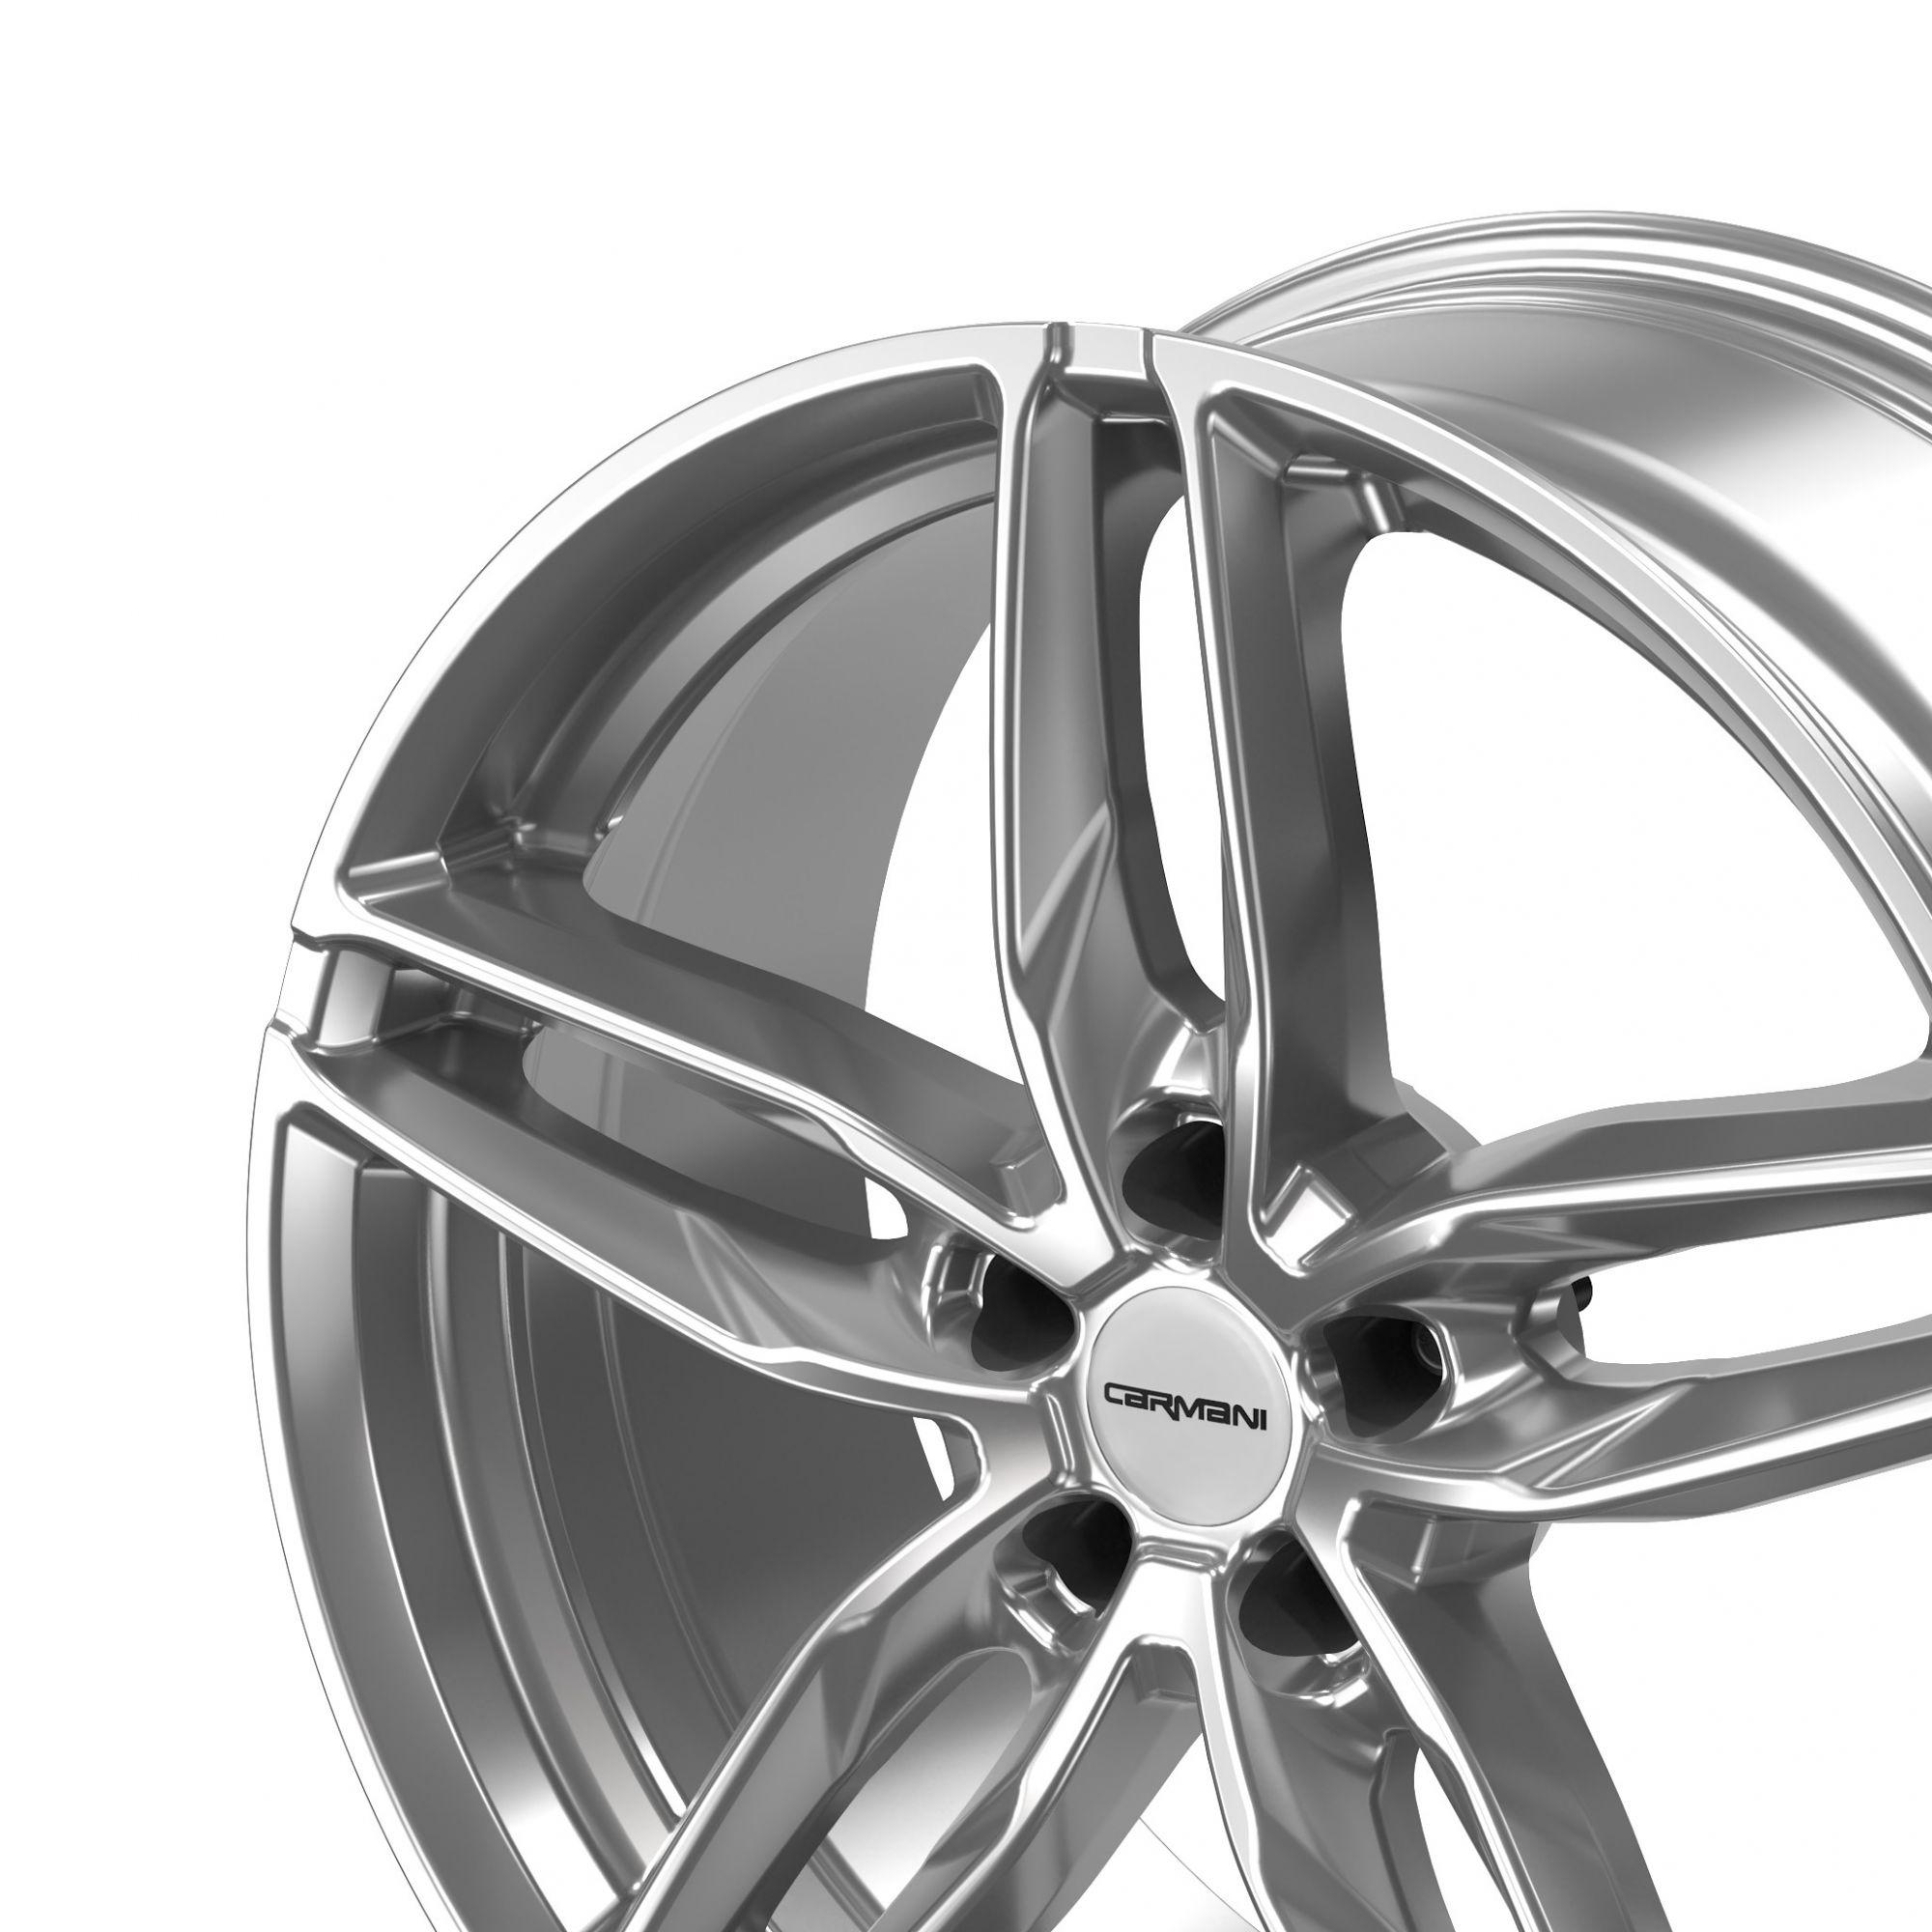 carmani 13 twinmax felgen bright silver silber in 19. Black Bedroom Furniture Sets. Home Design Ideas